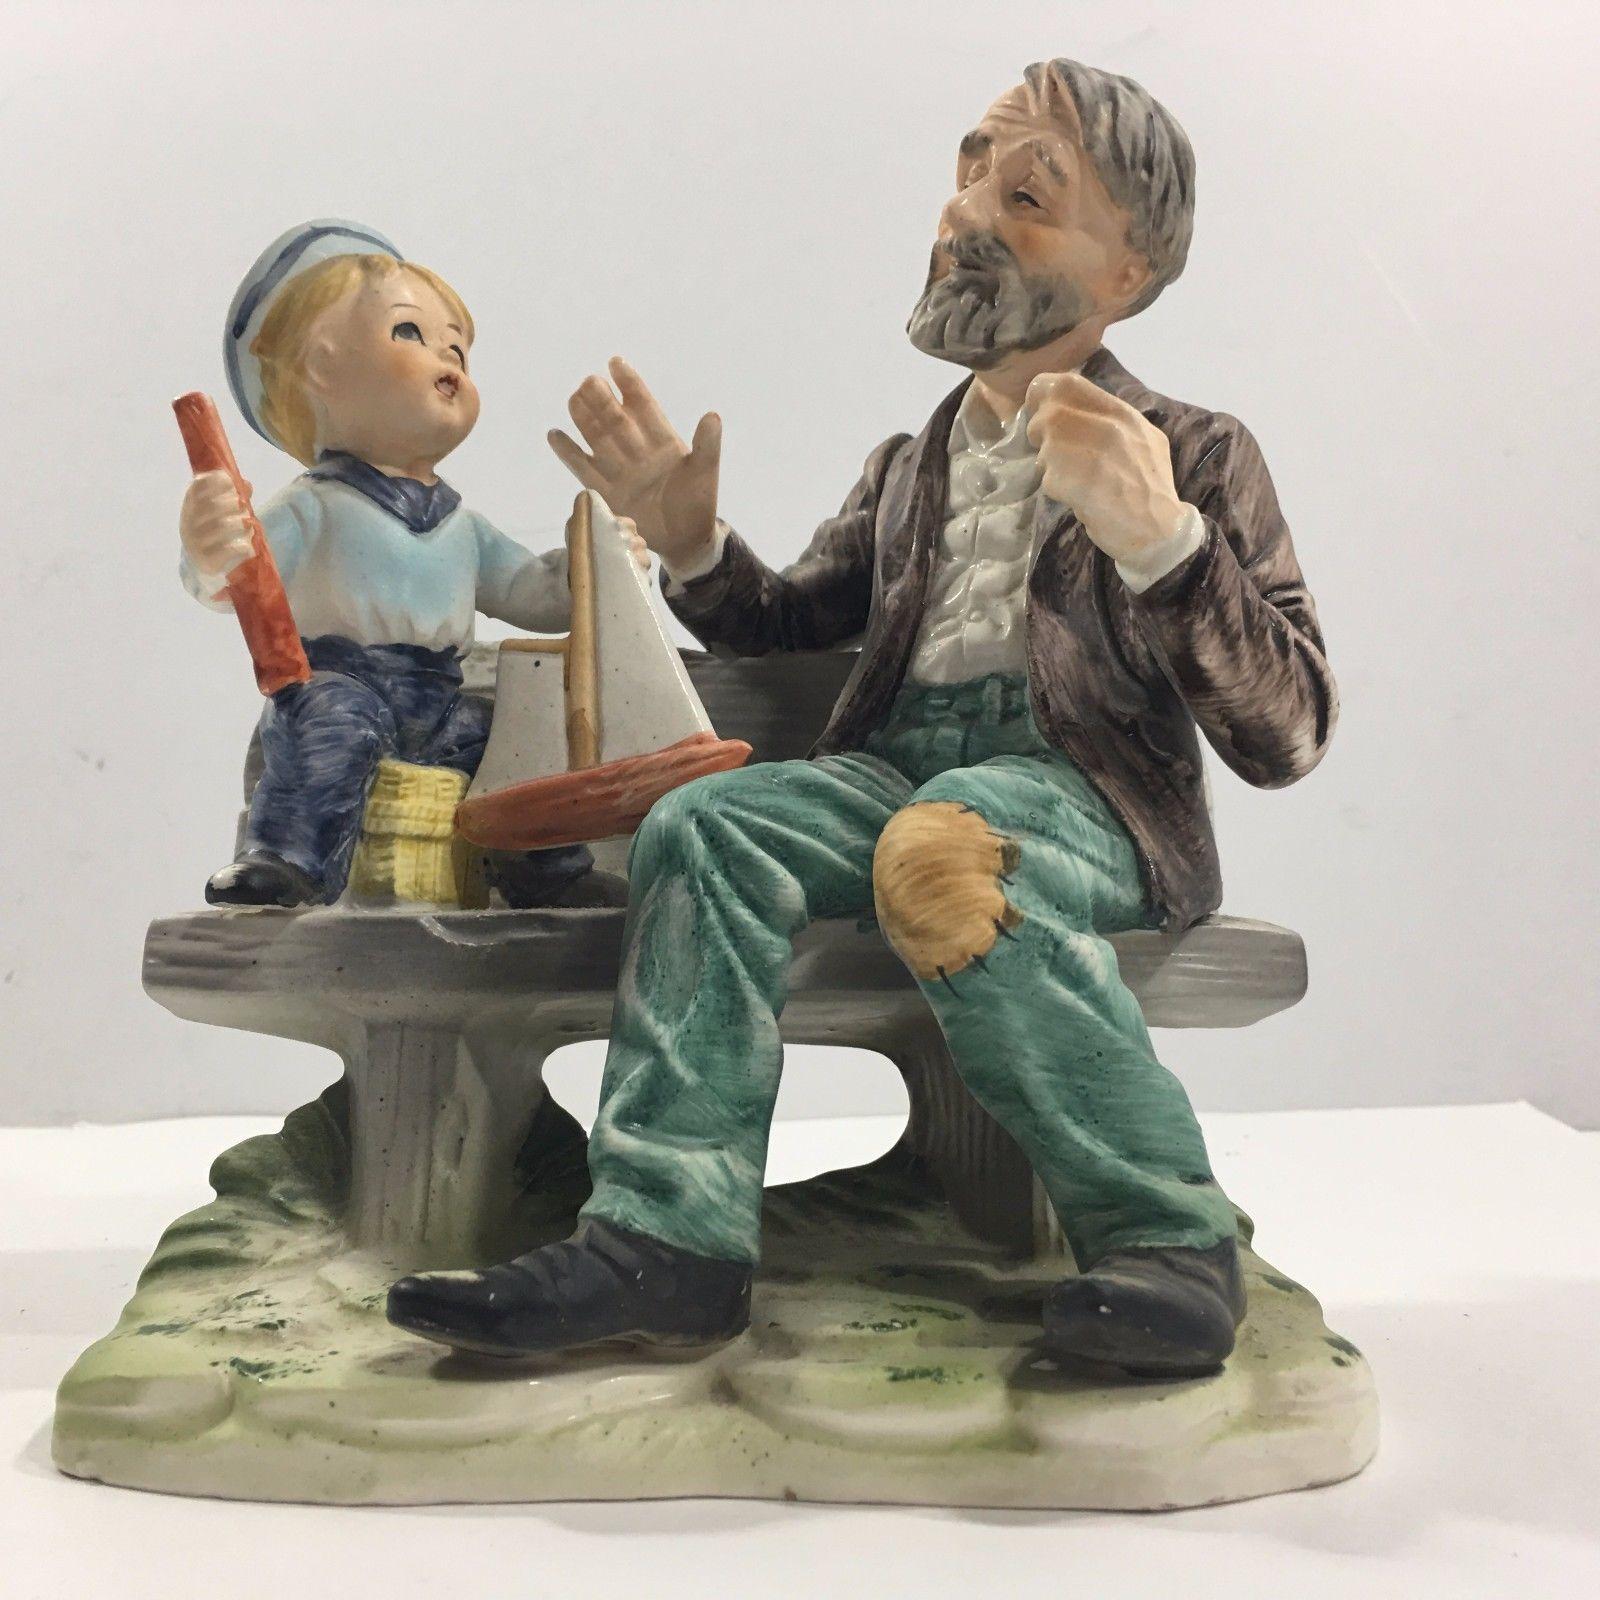 Vintage Porcelain Figurine, Man & Boy on Bench w Toy ...